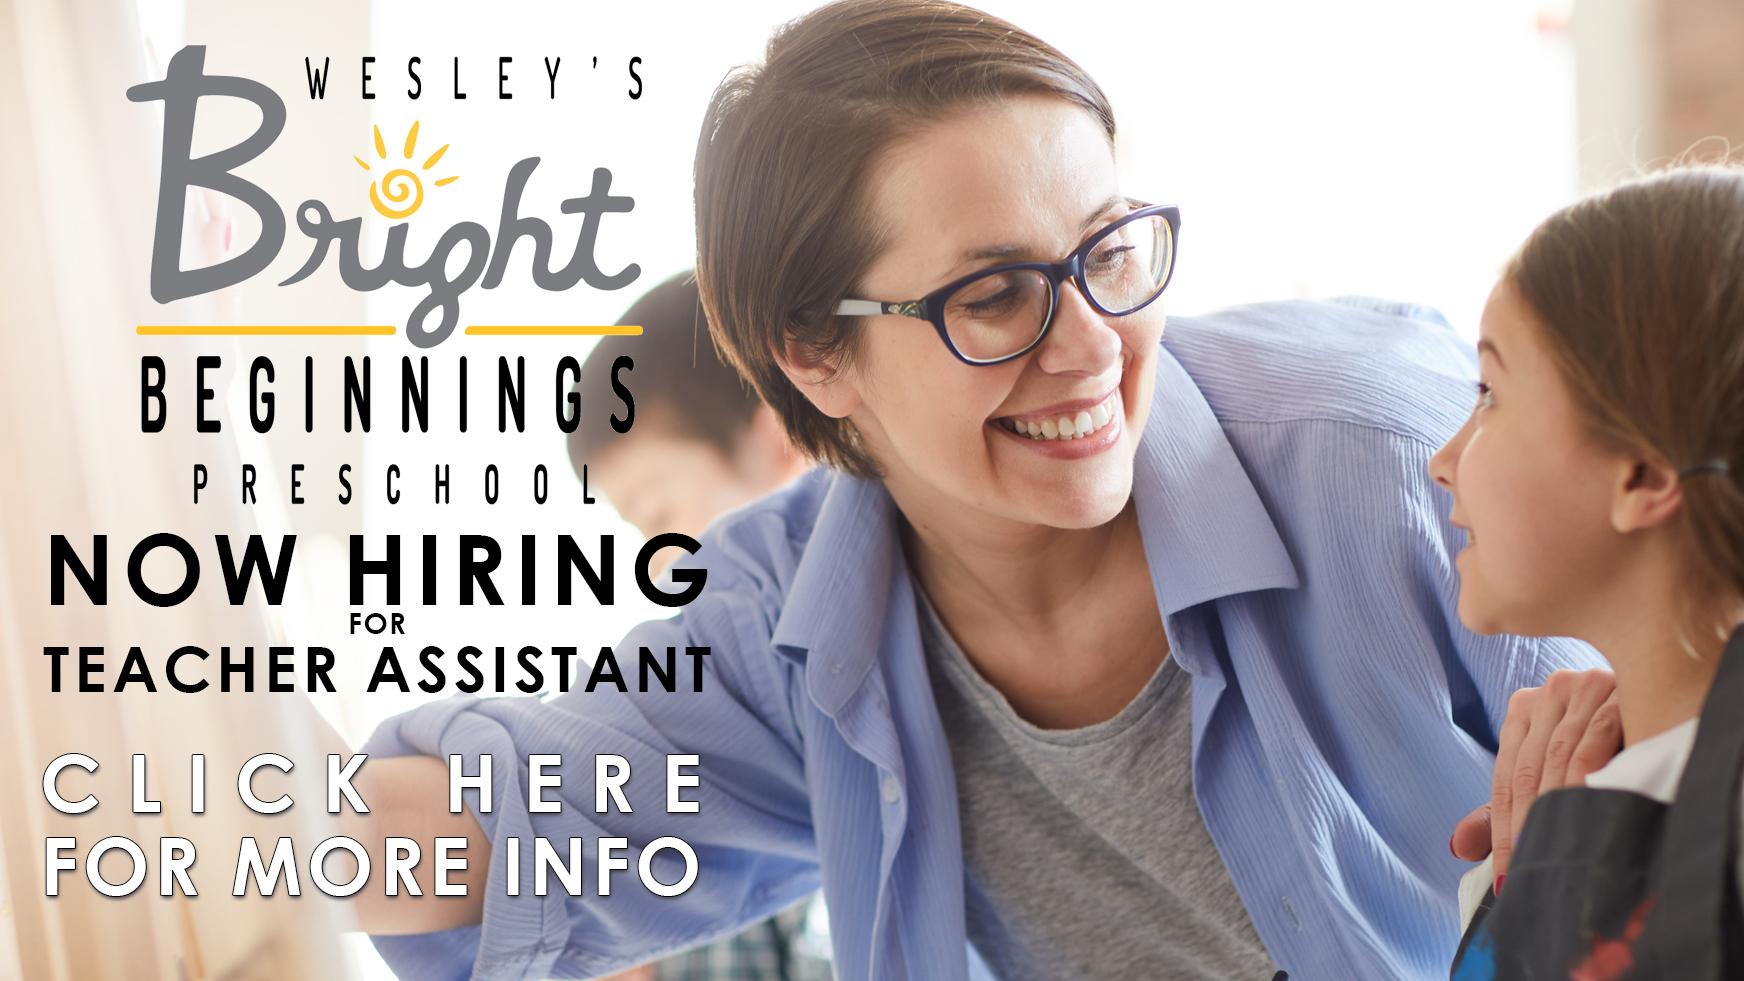 teacher's assistant job opening at wesley UMC BLOOMINGTON